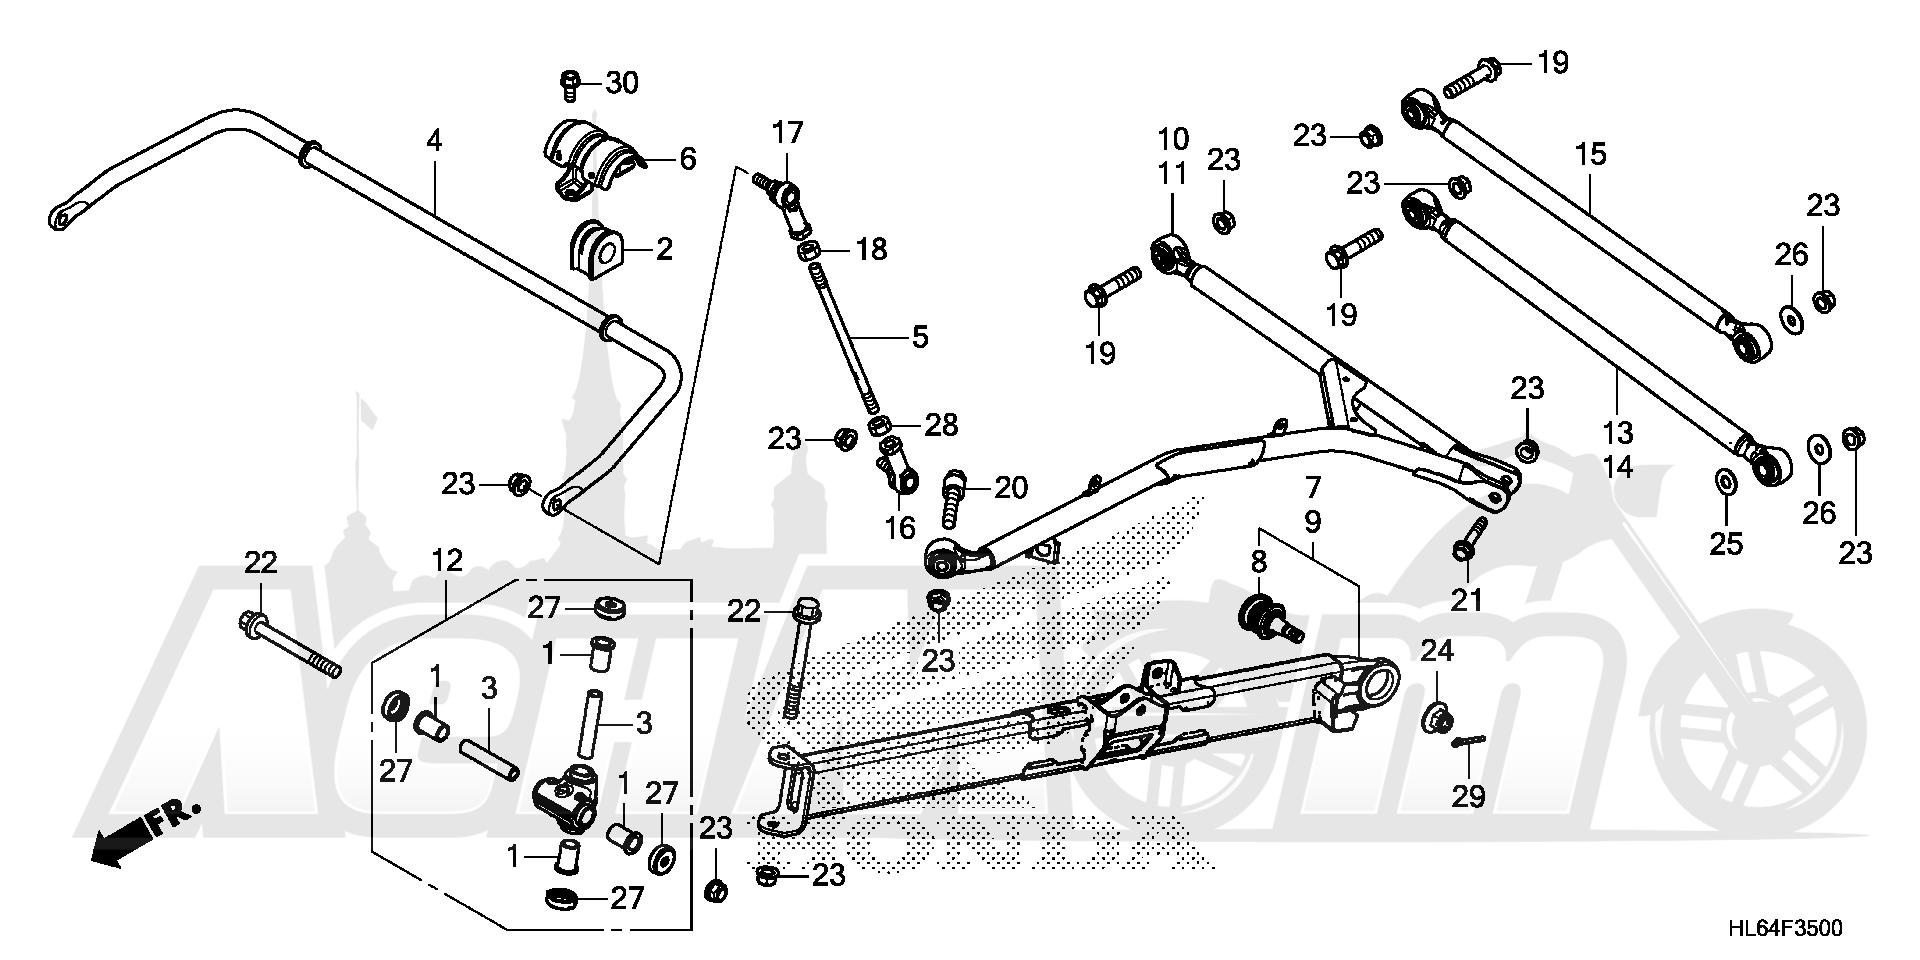 Запчасти для Квадроцикла Honda 2019 SXS1000S2R Раздел: REAR ARM AND REAR STABILIZER 2 | задний рычаг и зад стабилизатор 2